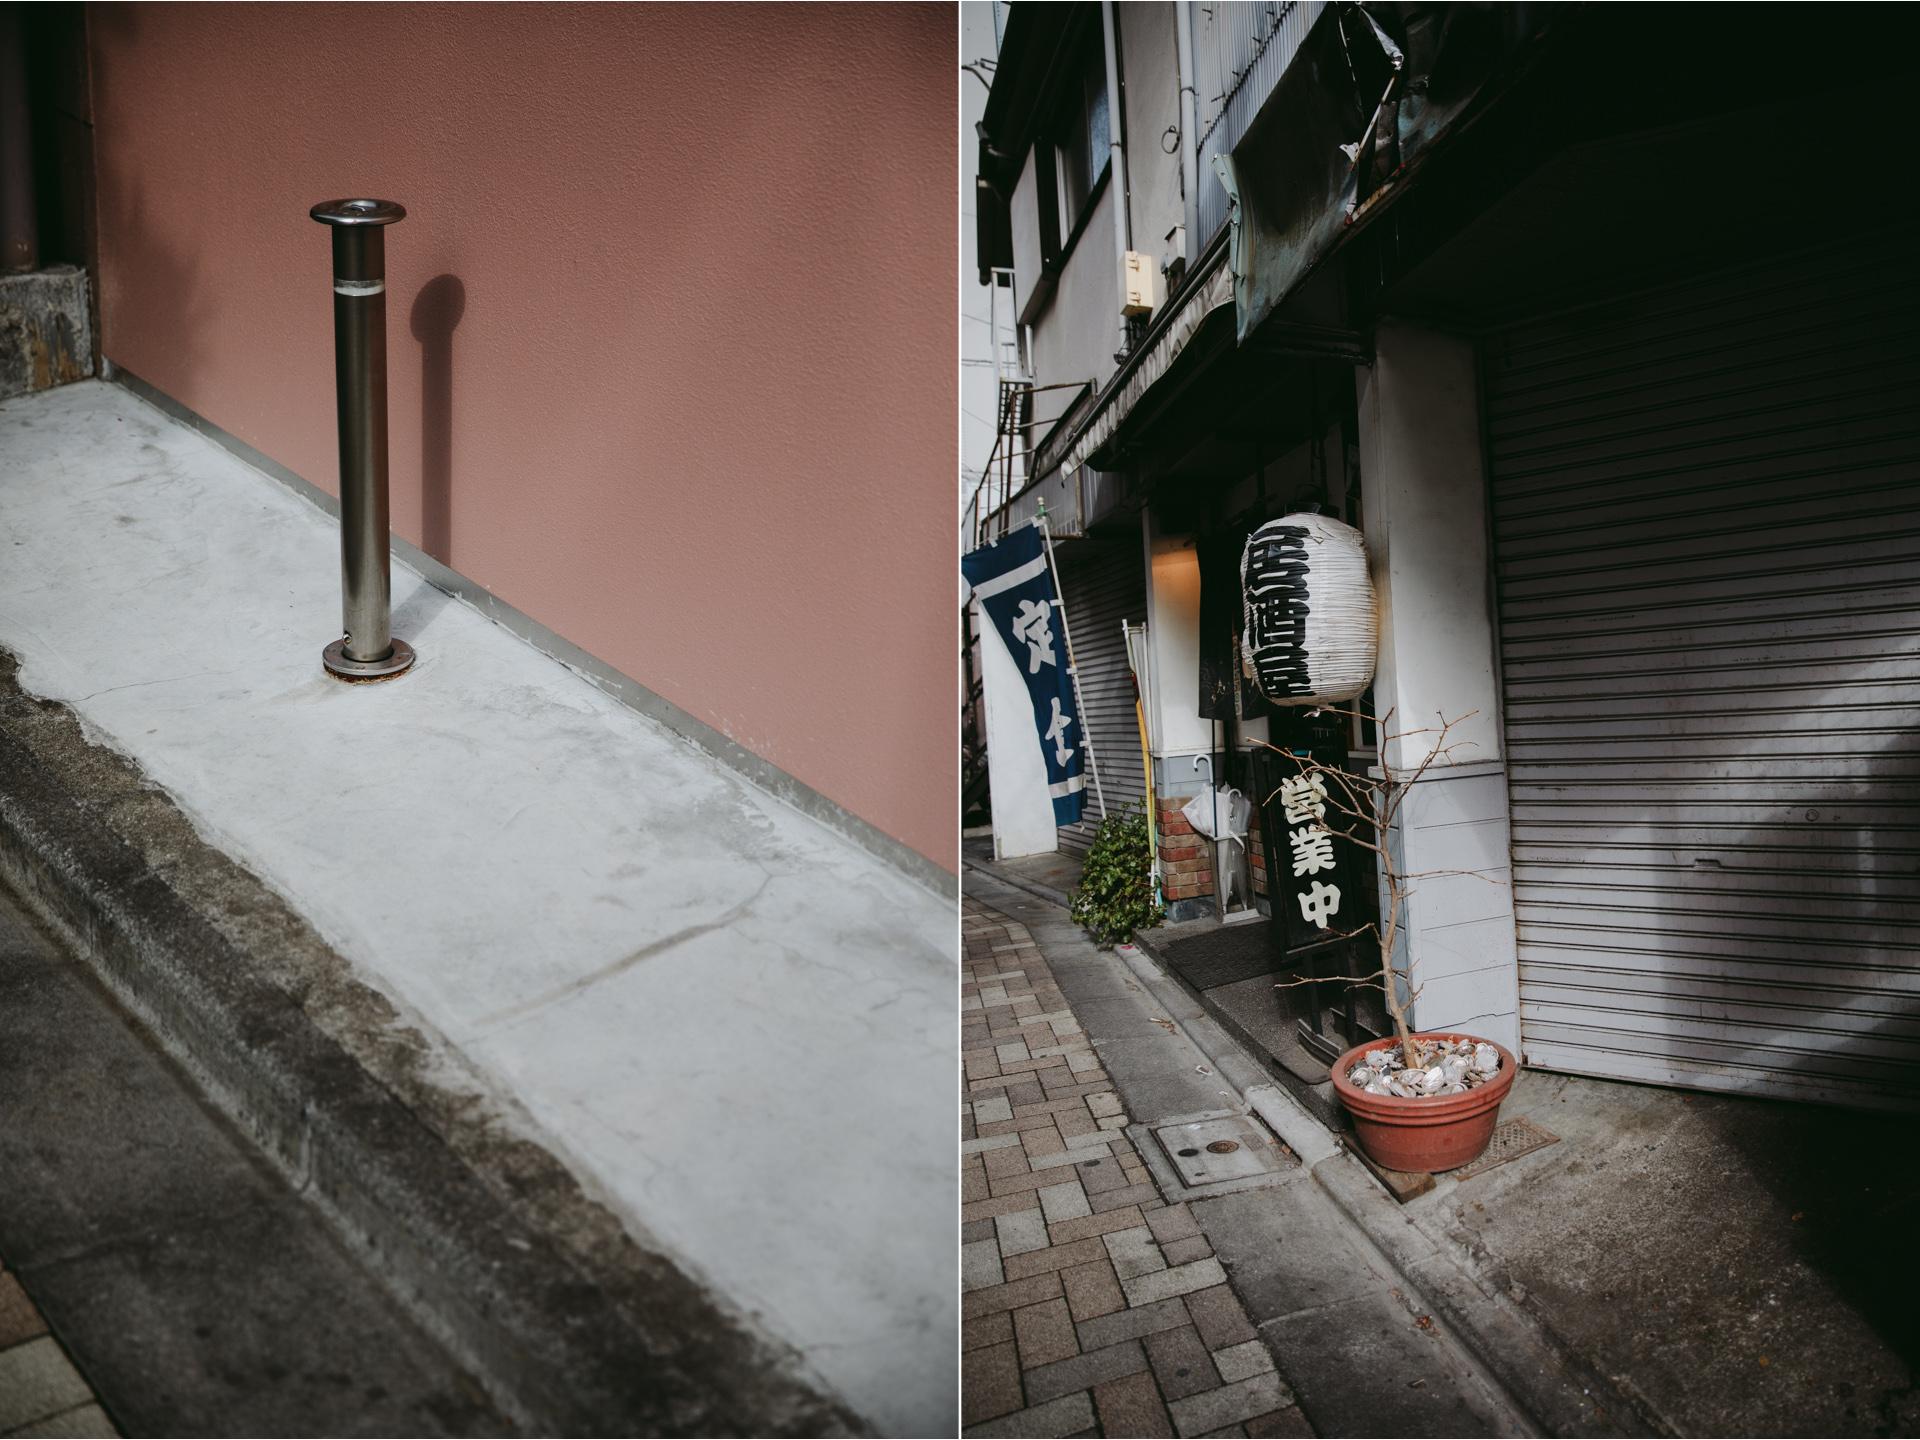 MikeSeehagel-commercial-lifestyle-travel-photography-Japan-V04.jpg